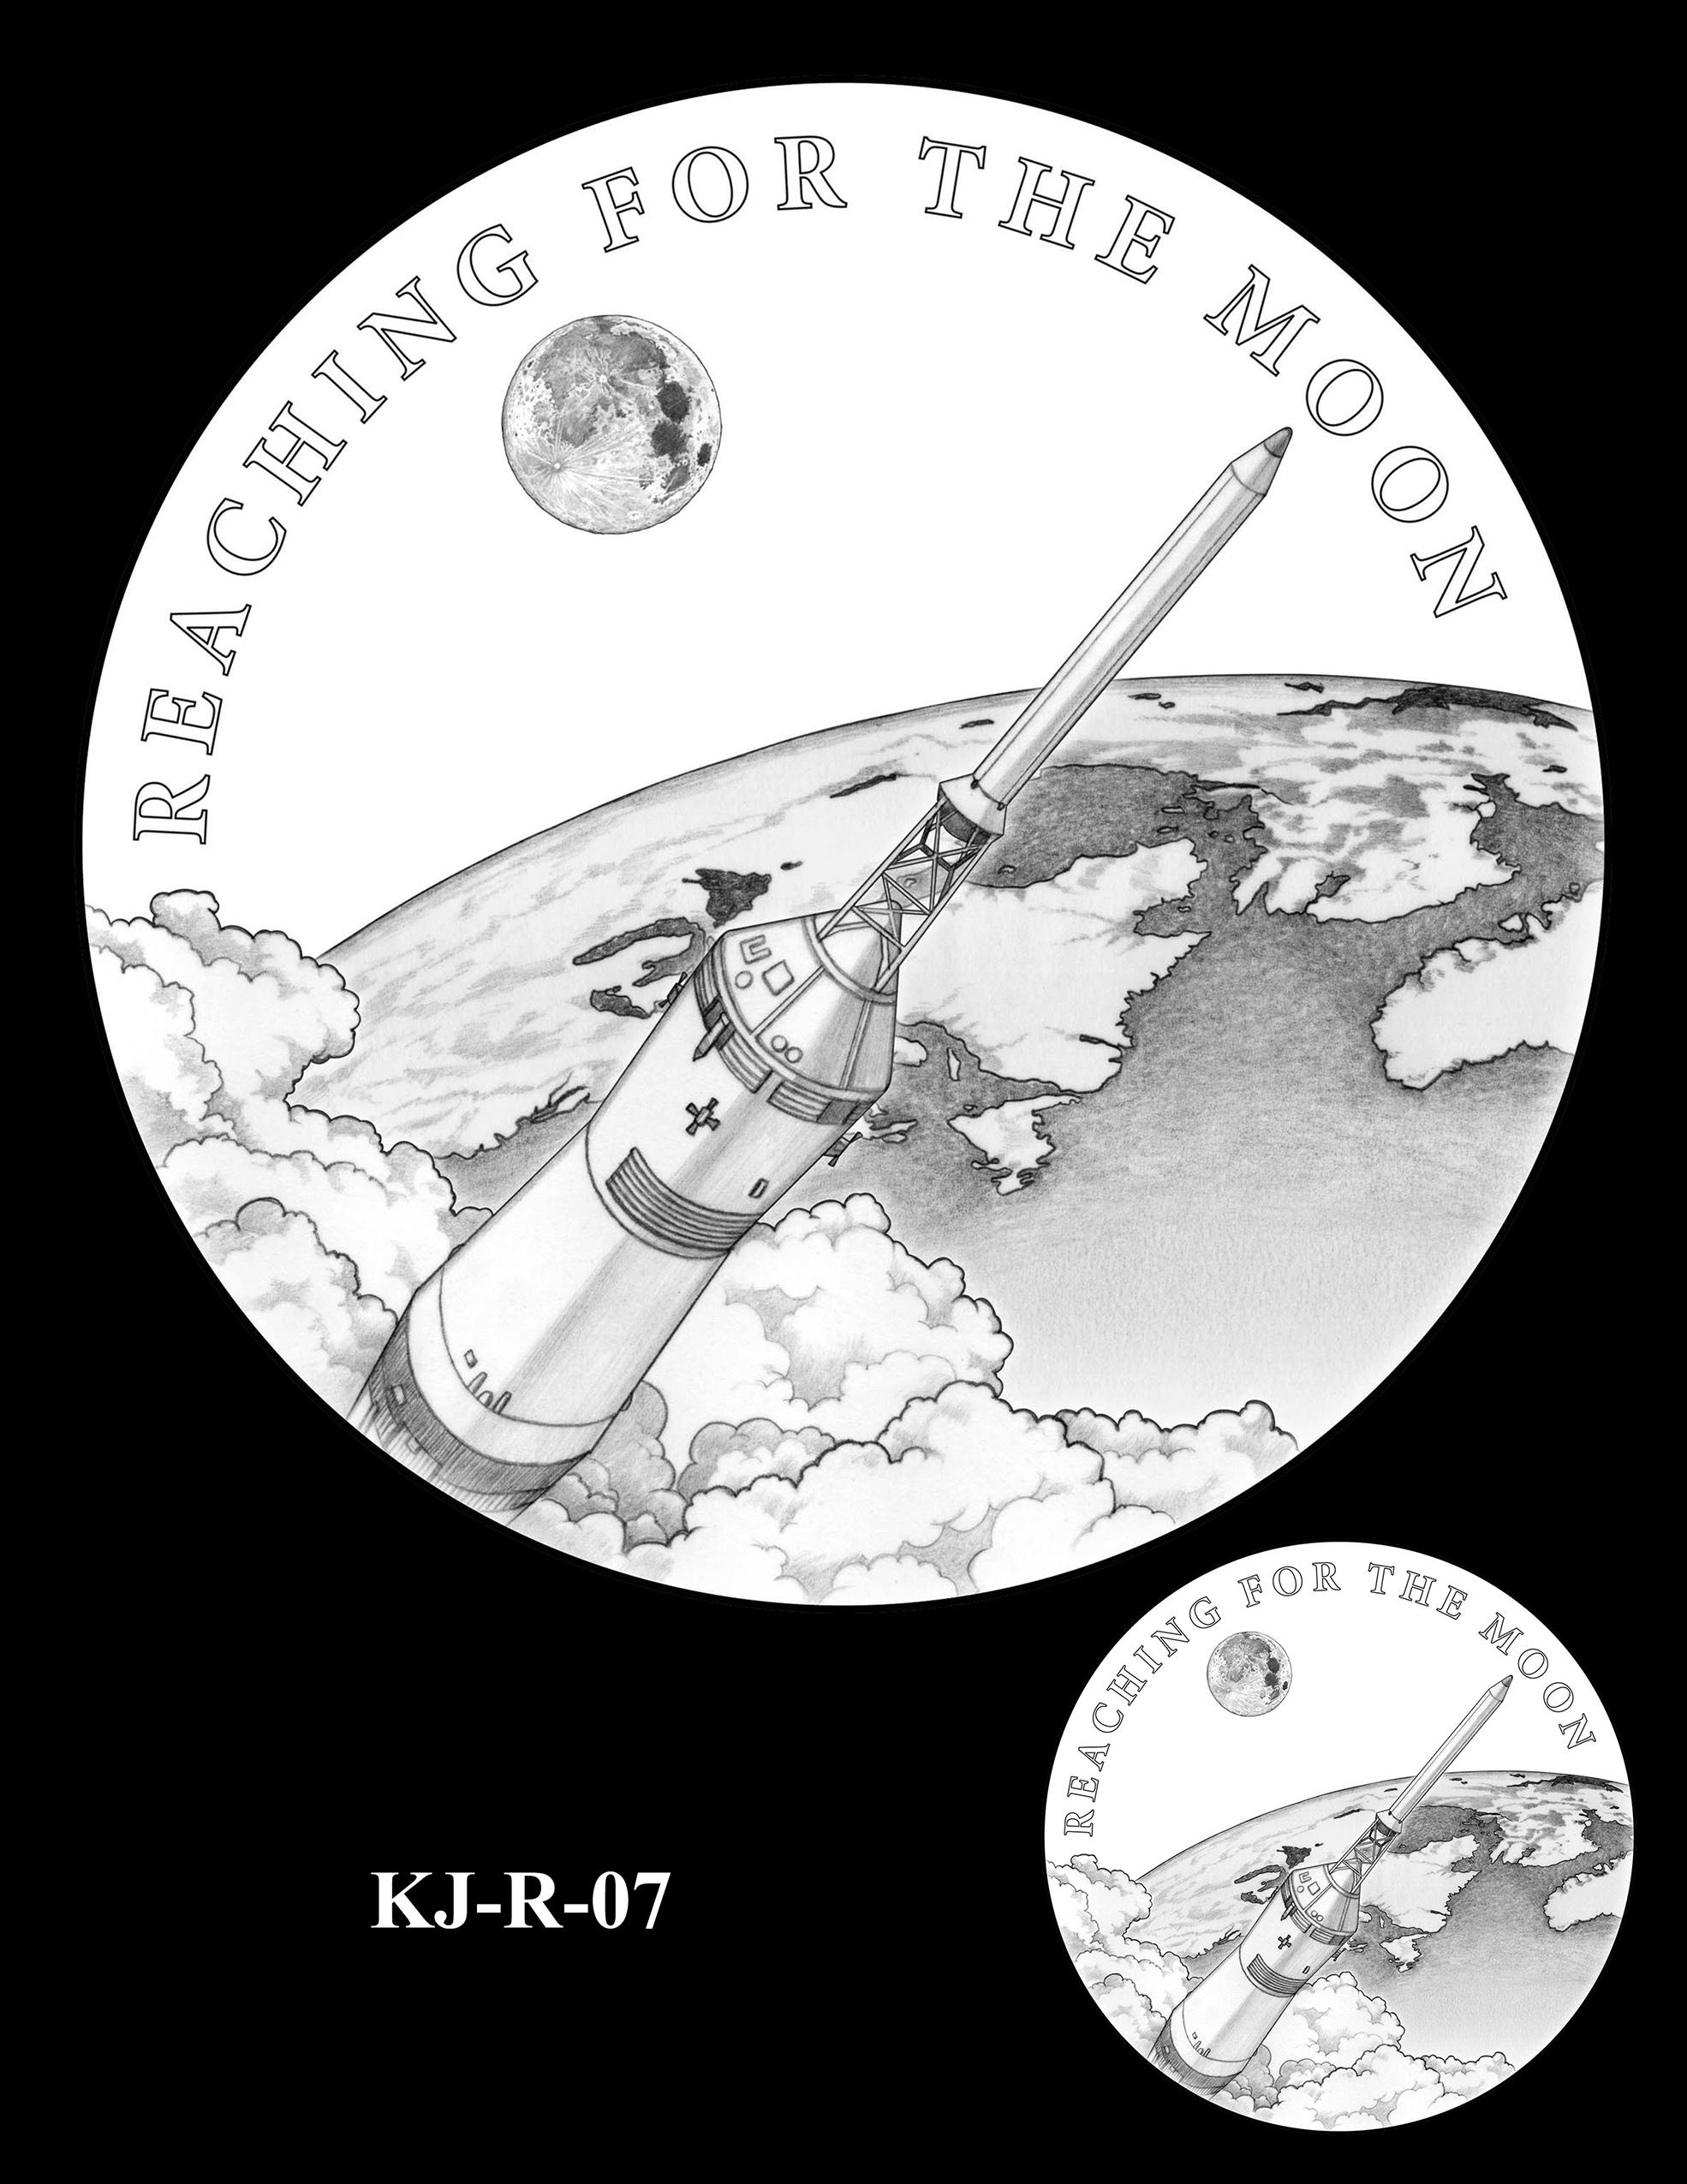 KJ-R-07 -- Katherine Johnson Congressional Gold Medal